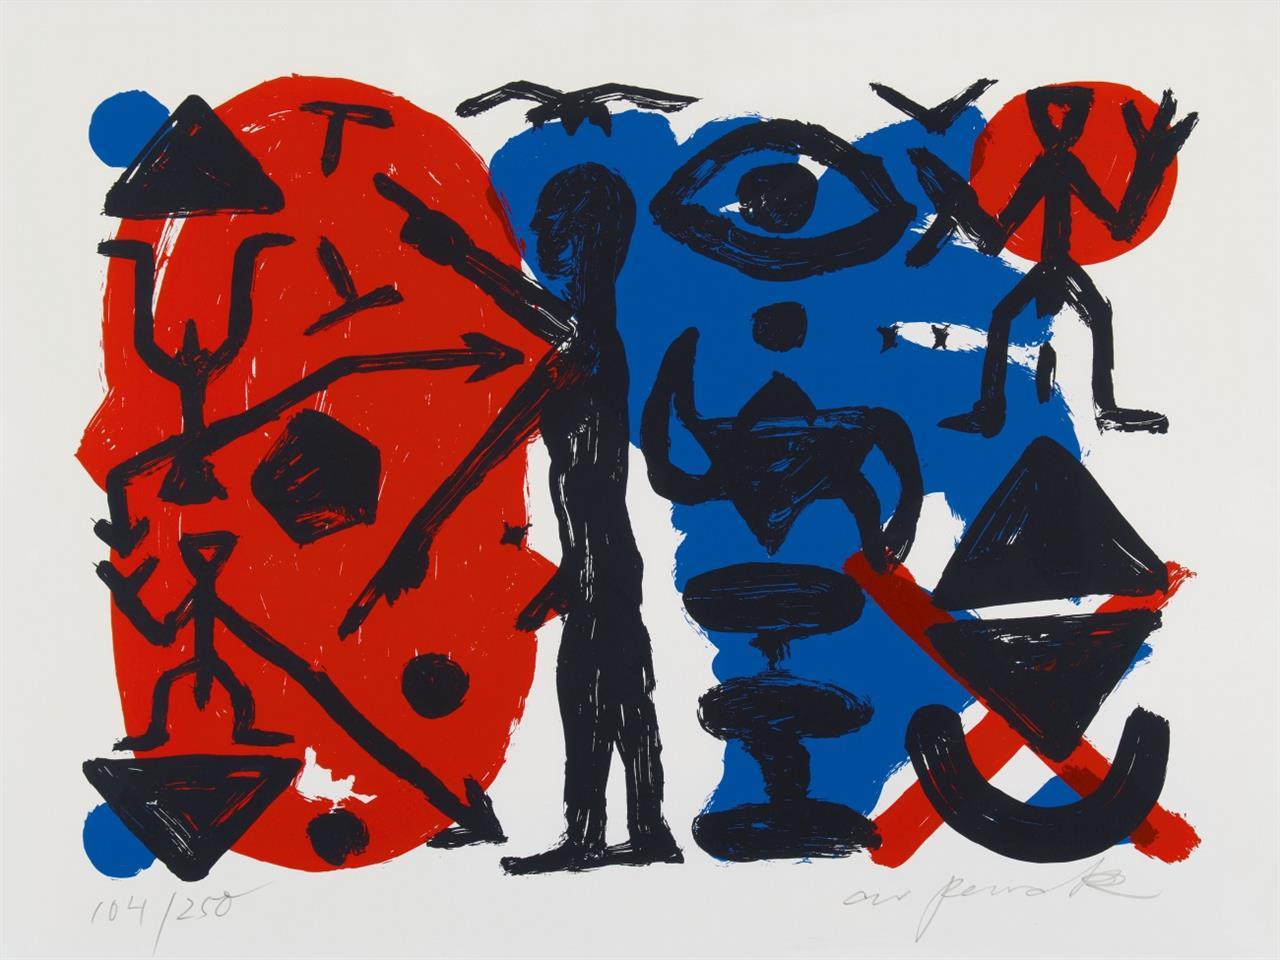 A.R. Penck. Ohne Titel. Farbserigraphie. Signiert. Ex. 104/250.